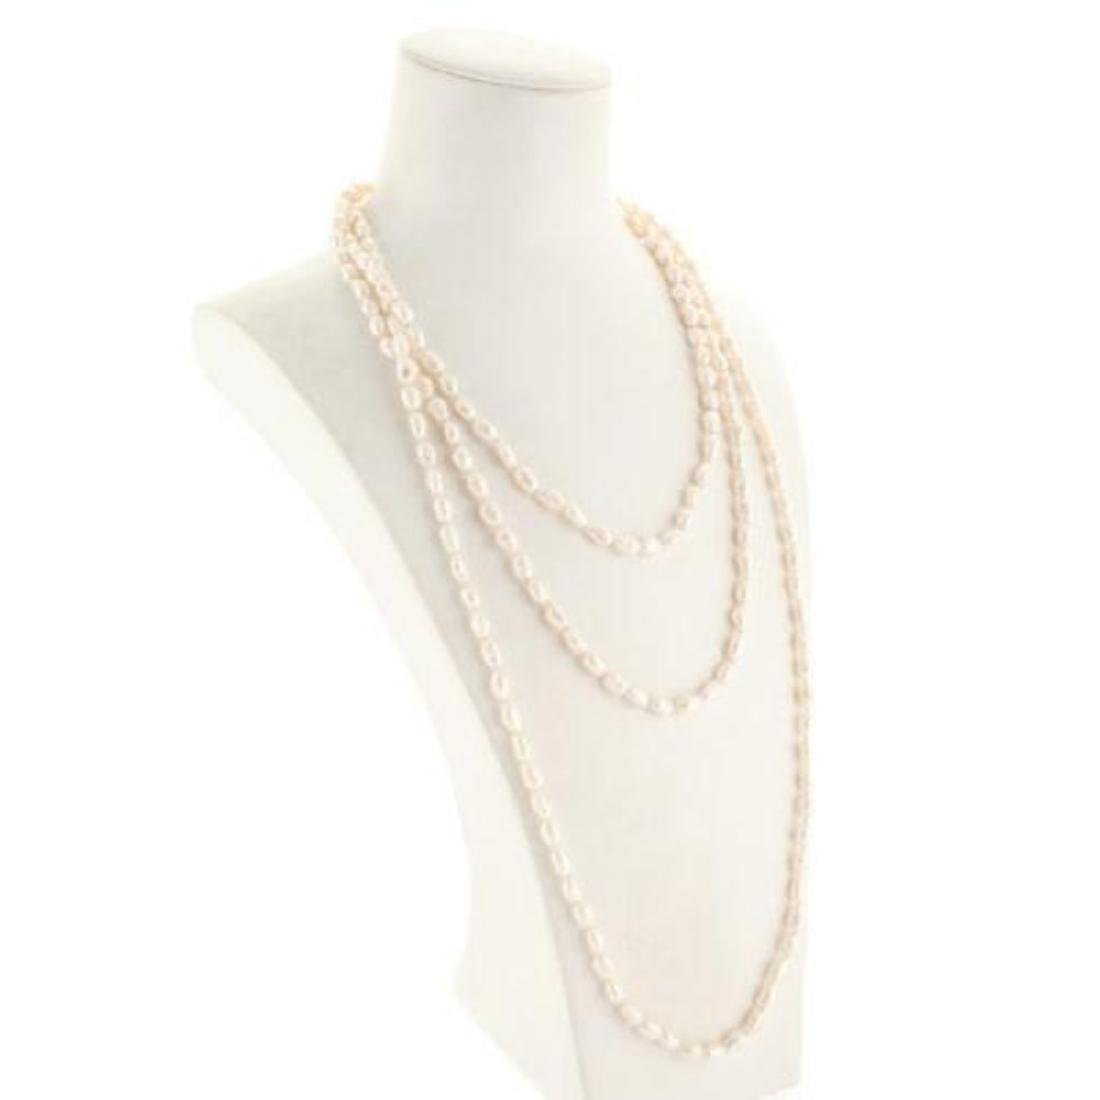 Designer White Fresh Water Pearl Strand Necklace - 3